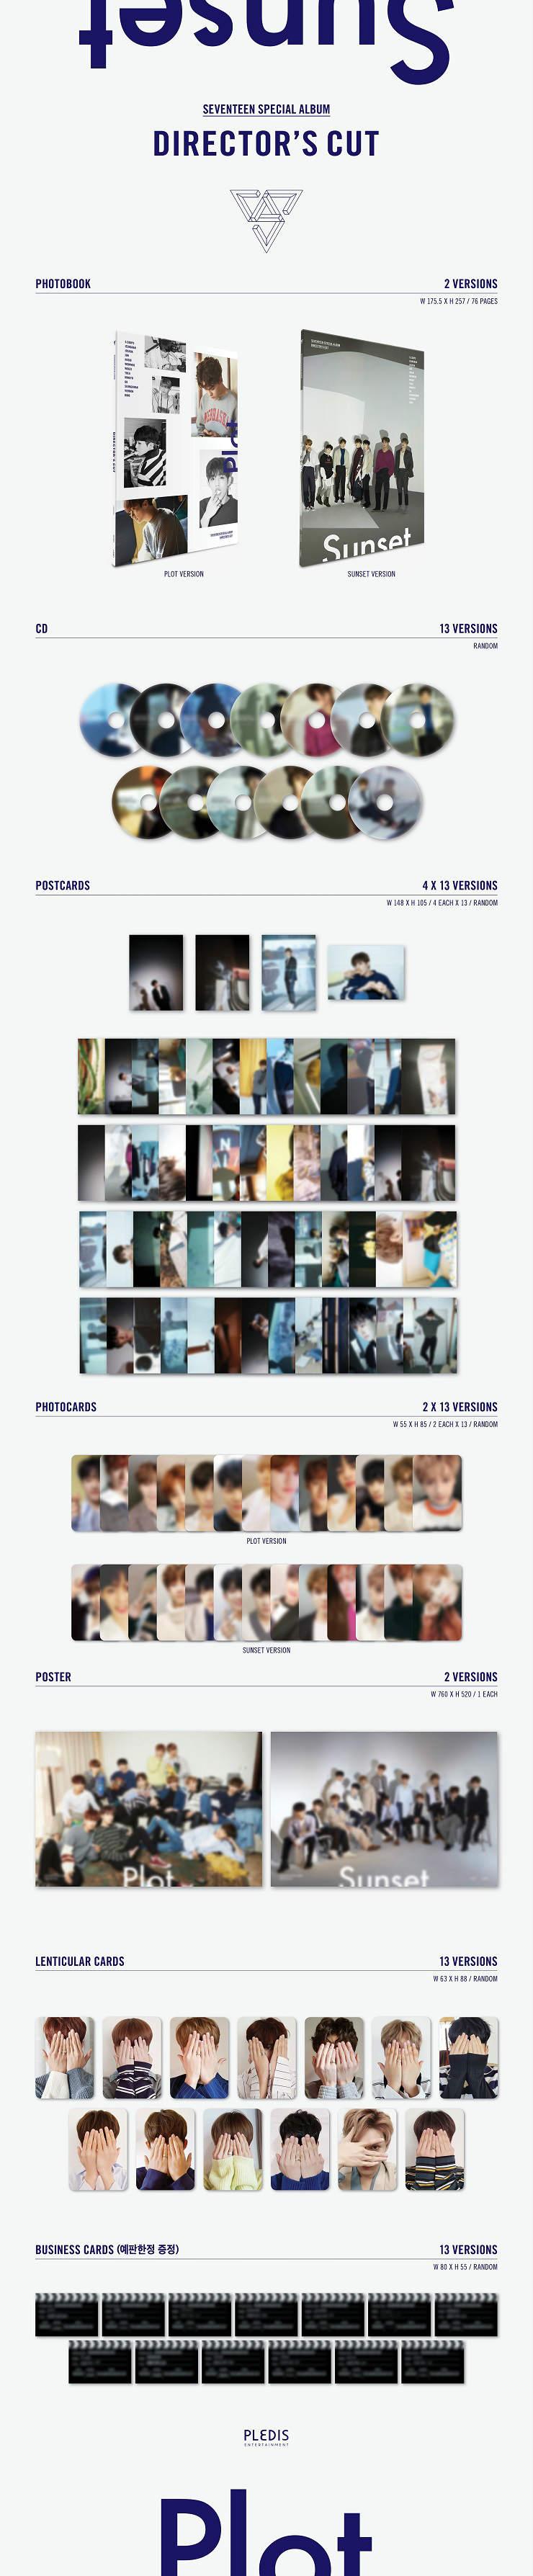 Image result for seventeen special album director's cut